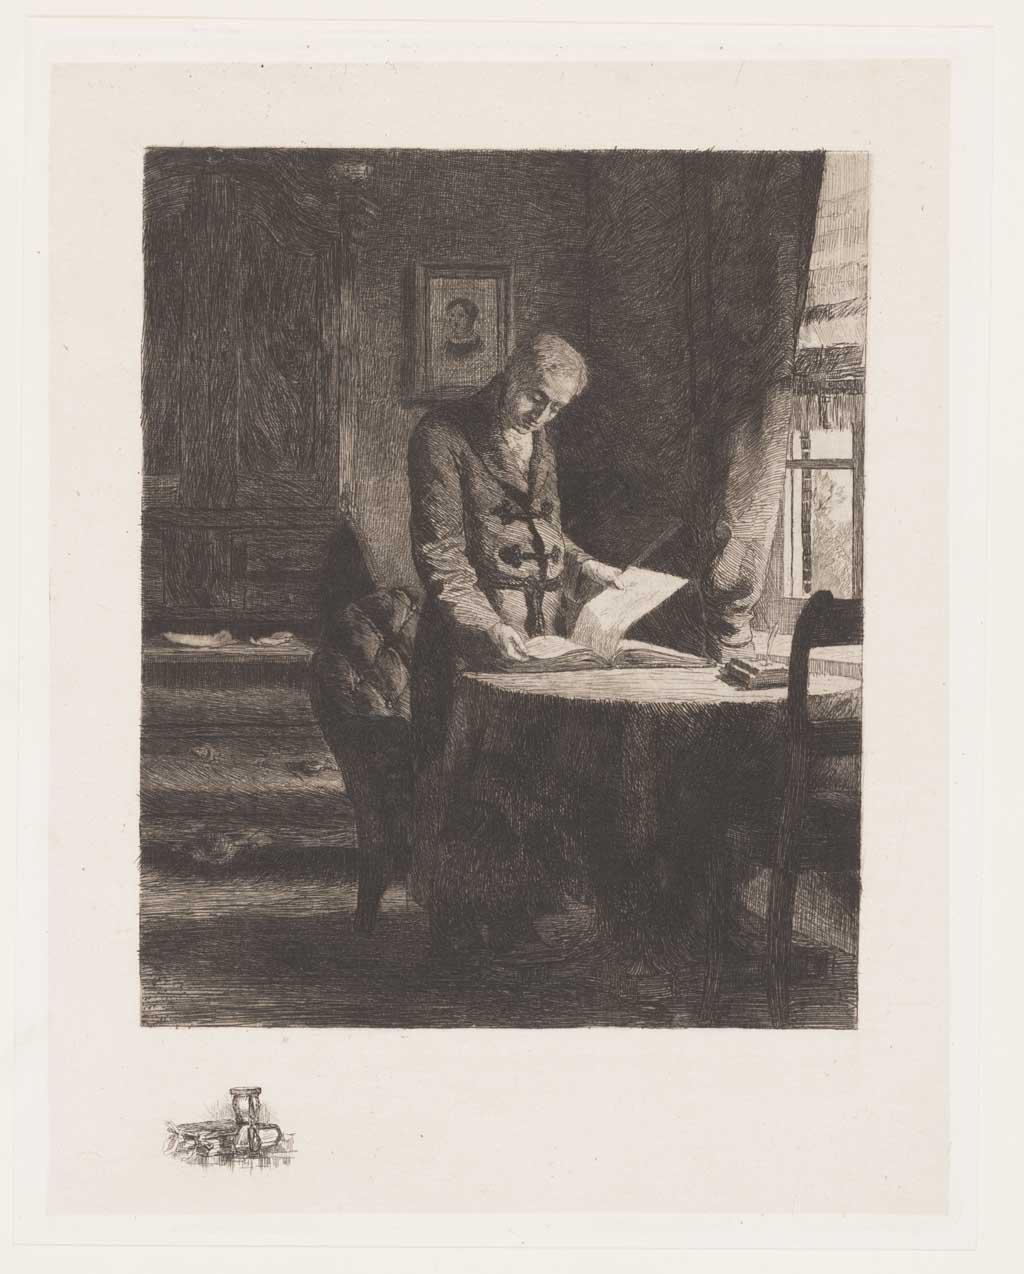 Interieur met lezende man